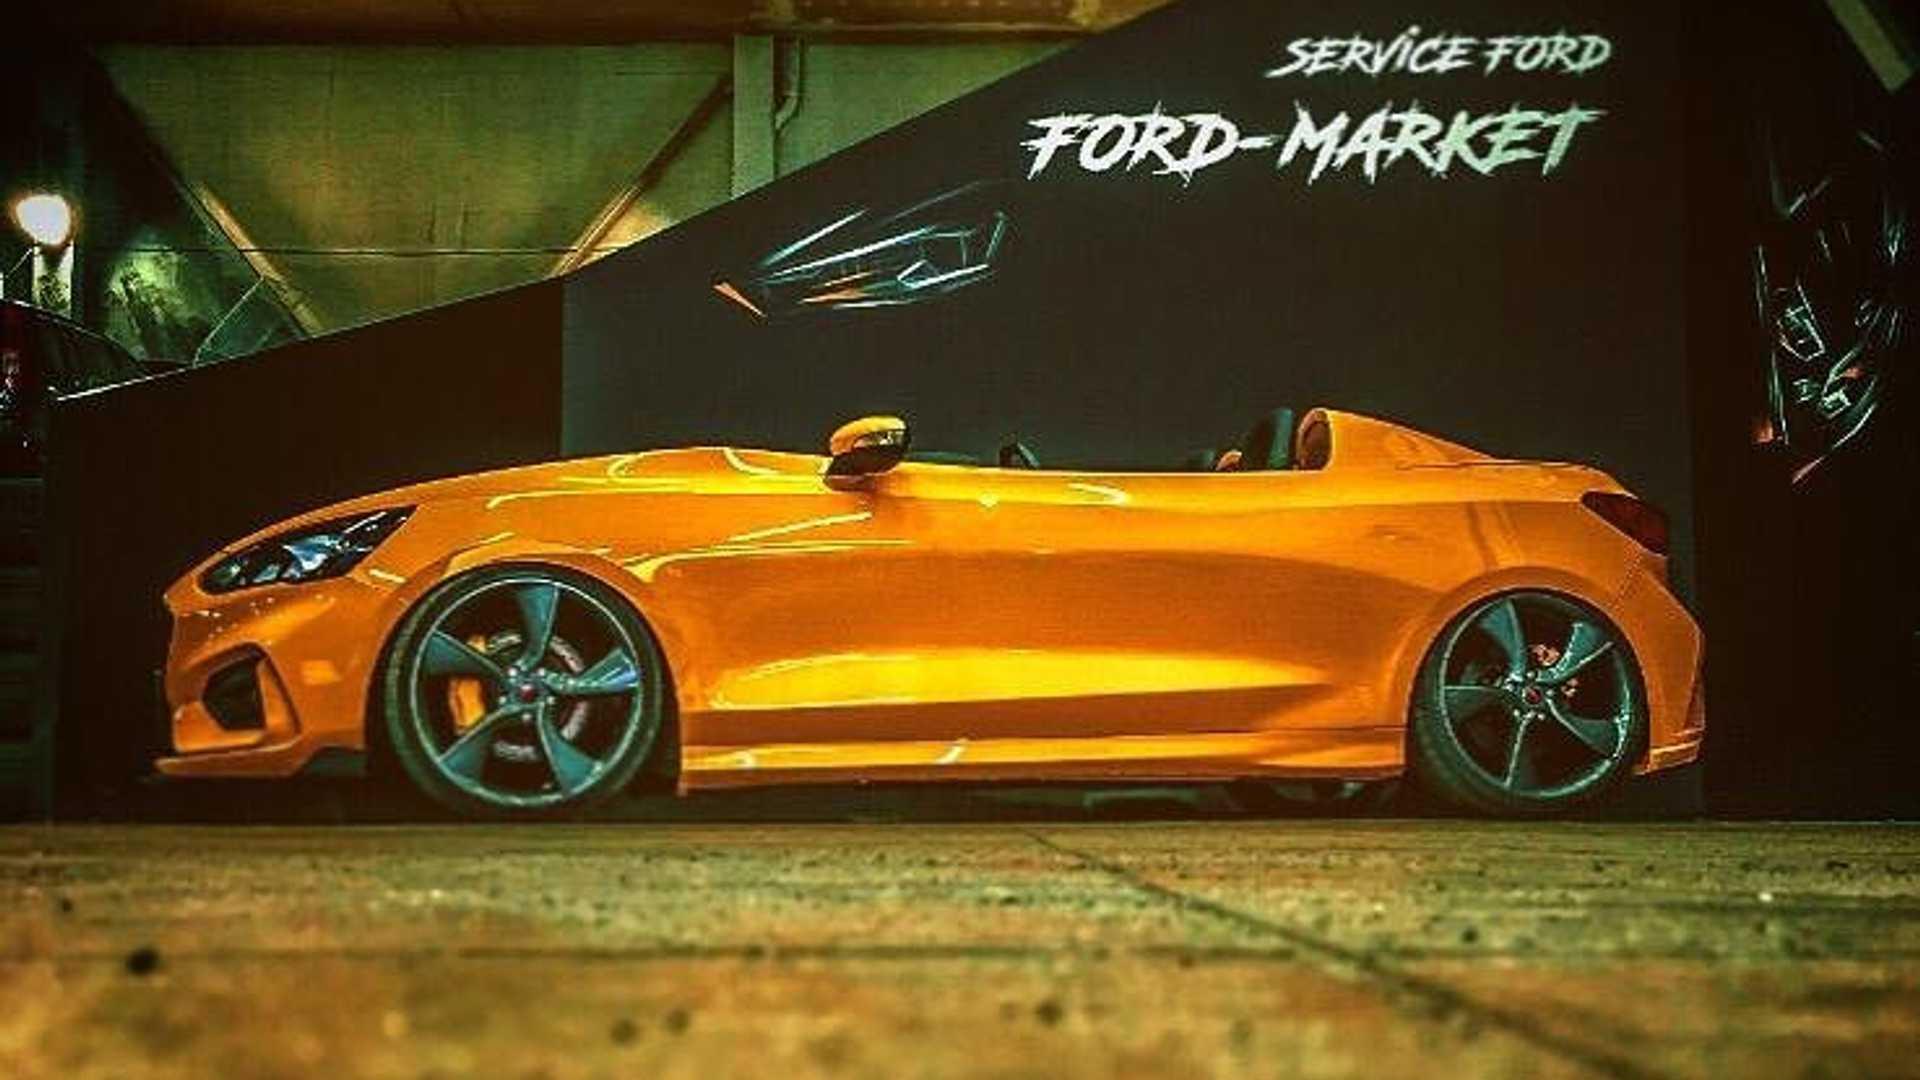 Ford_Focus_speedster_conversion_0005